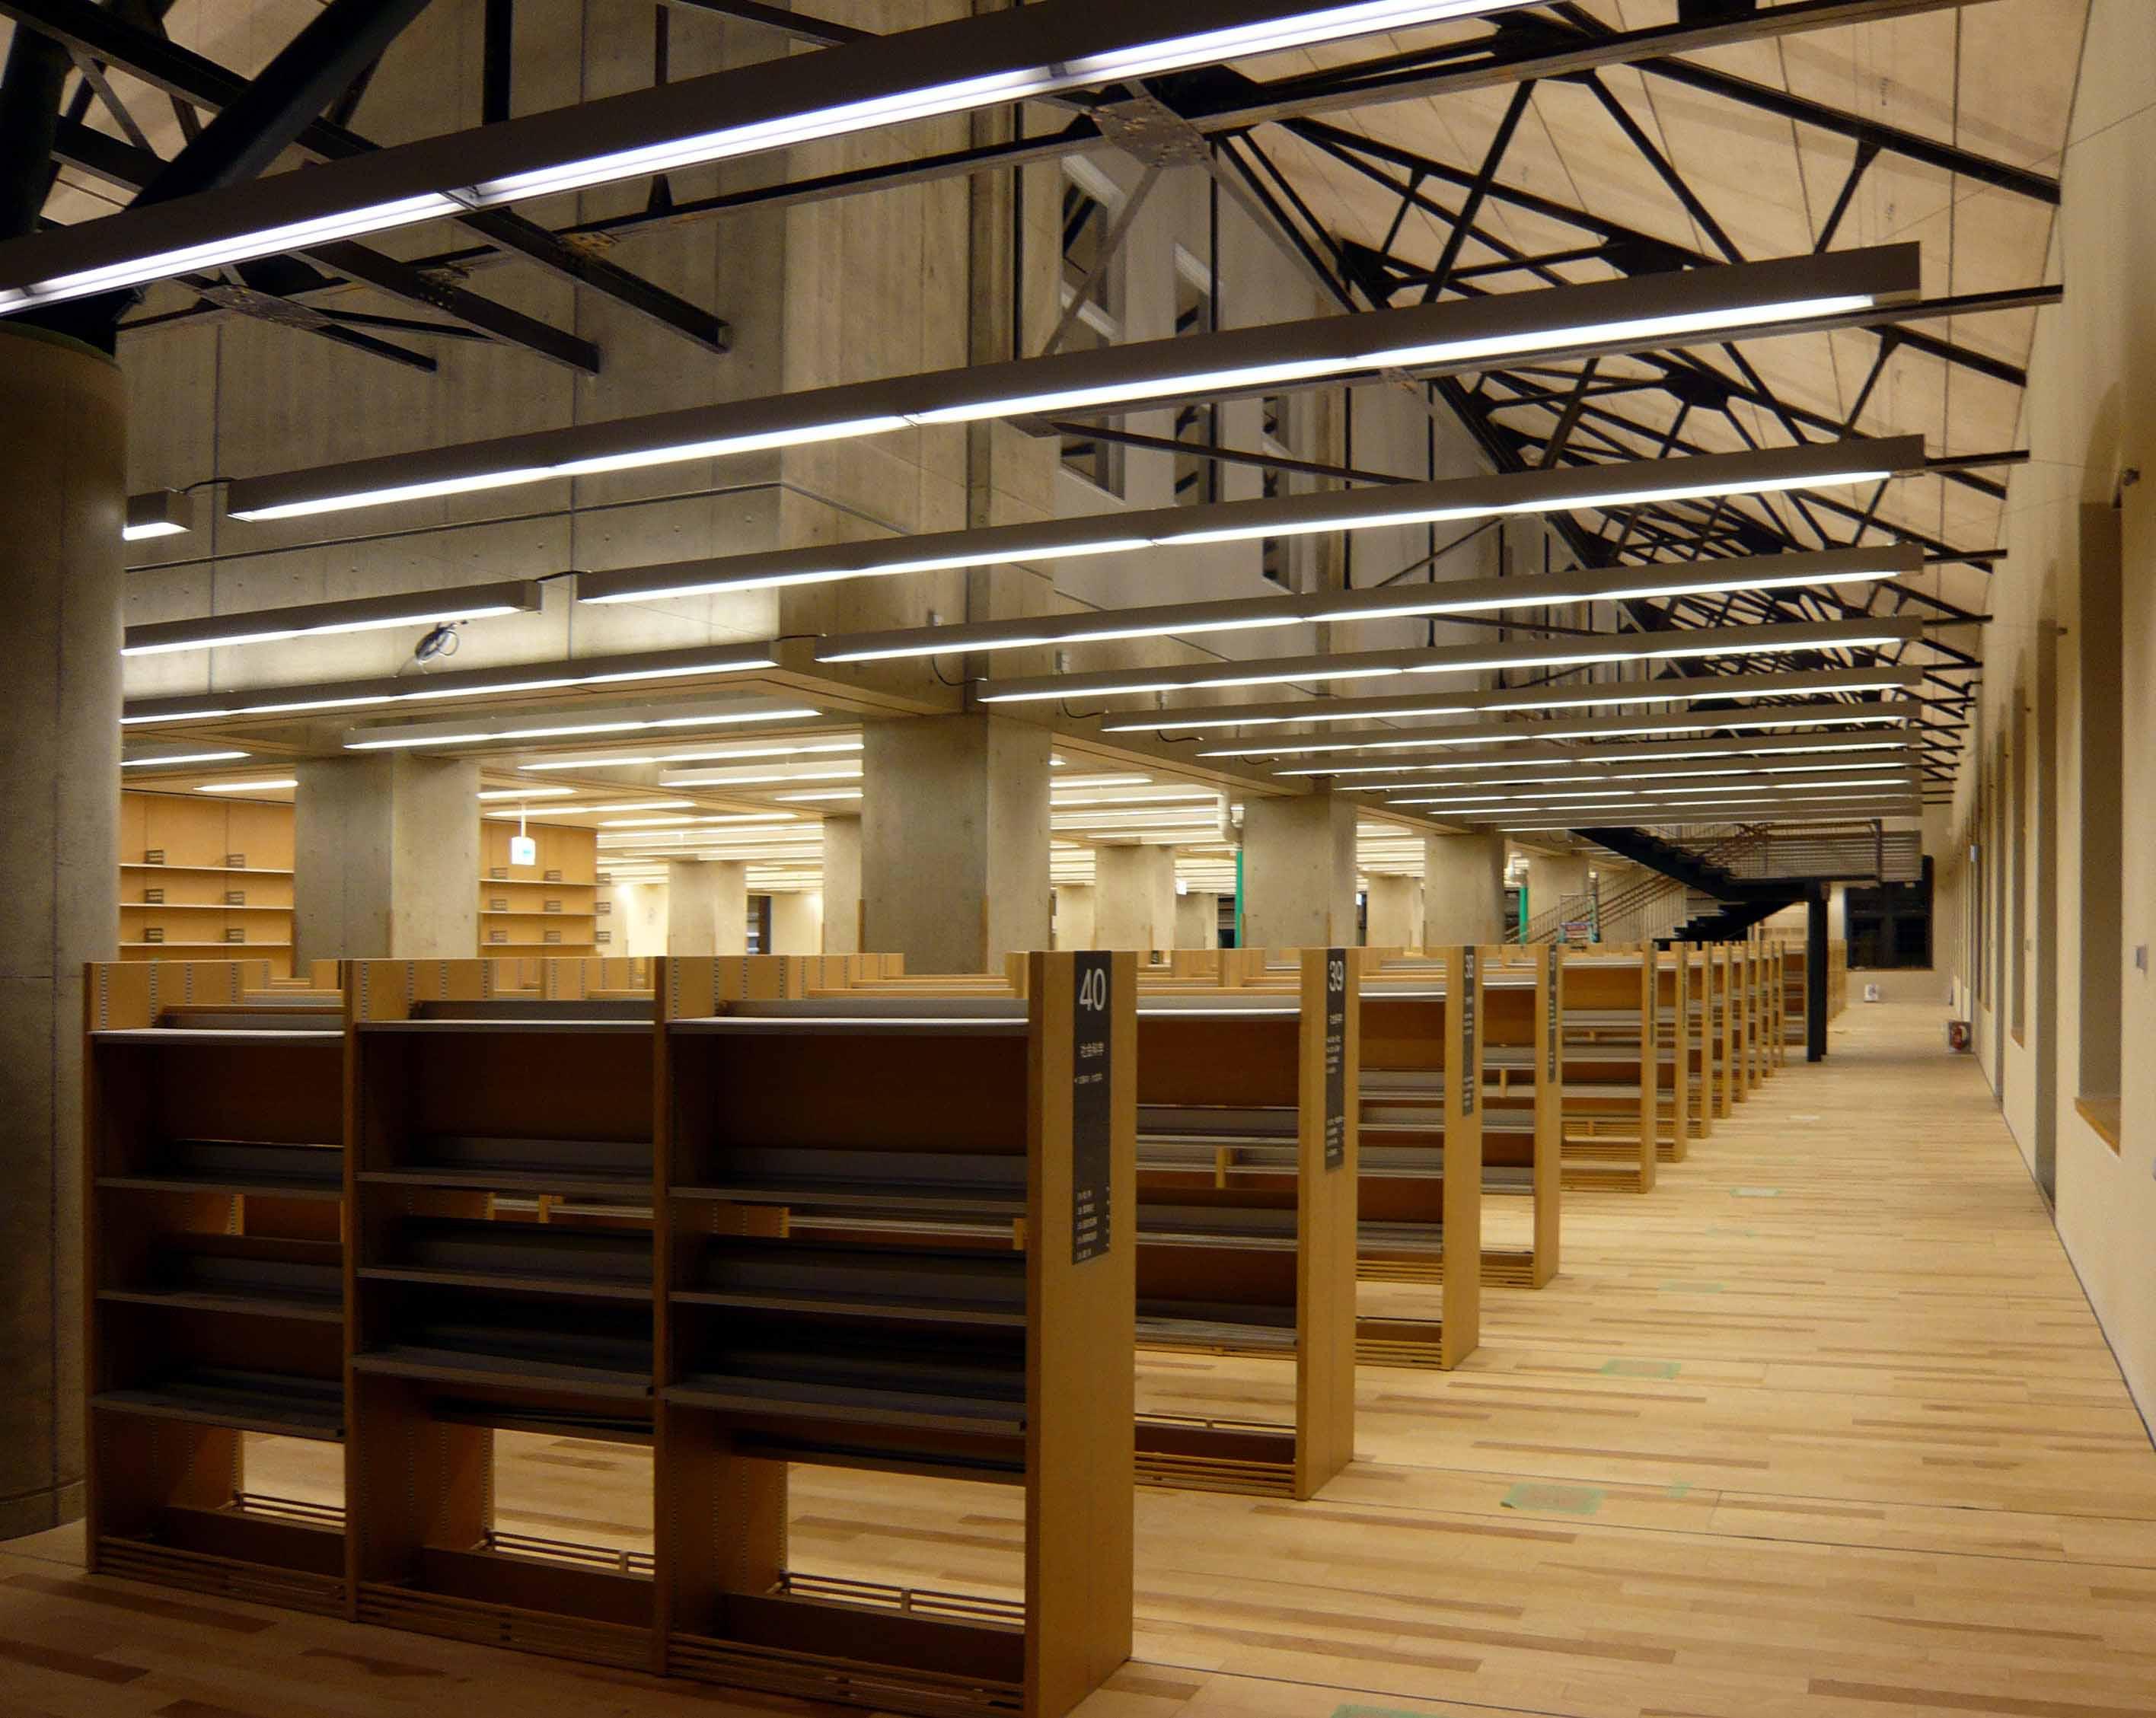 中古自転車 中古自転車 京都 北区 : 080628北区新中央図書館オープン ...